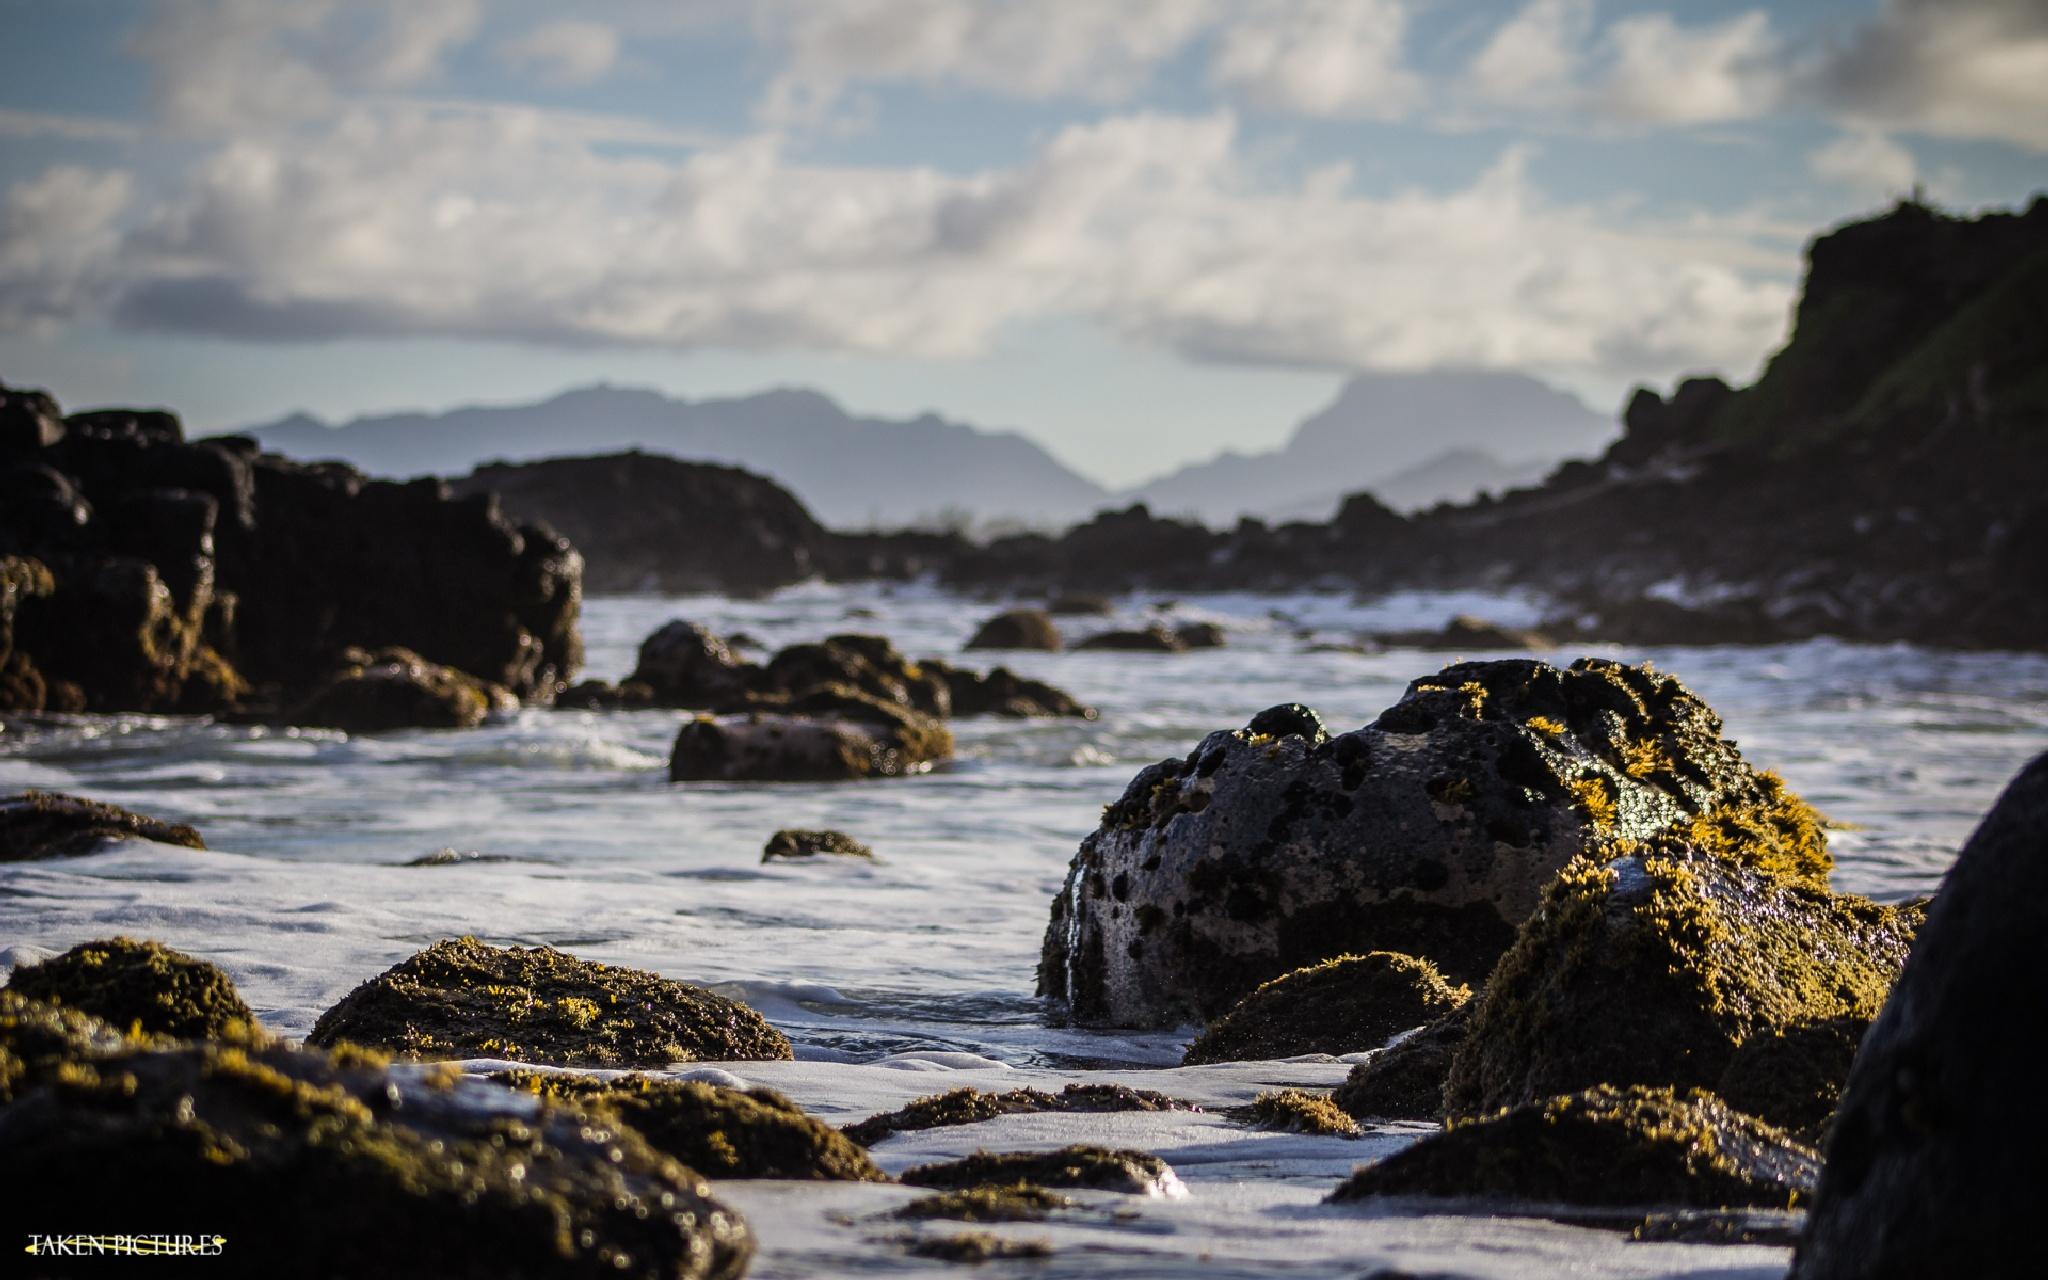 Along The Rocky Shore by Richard Taken